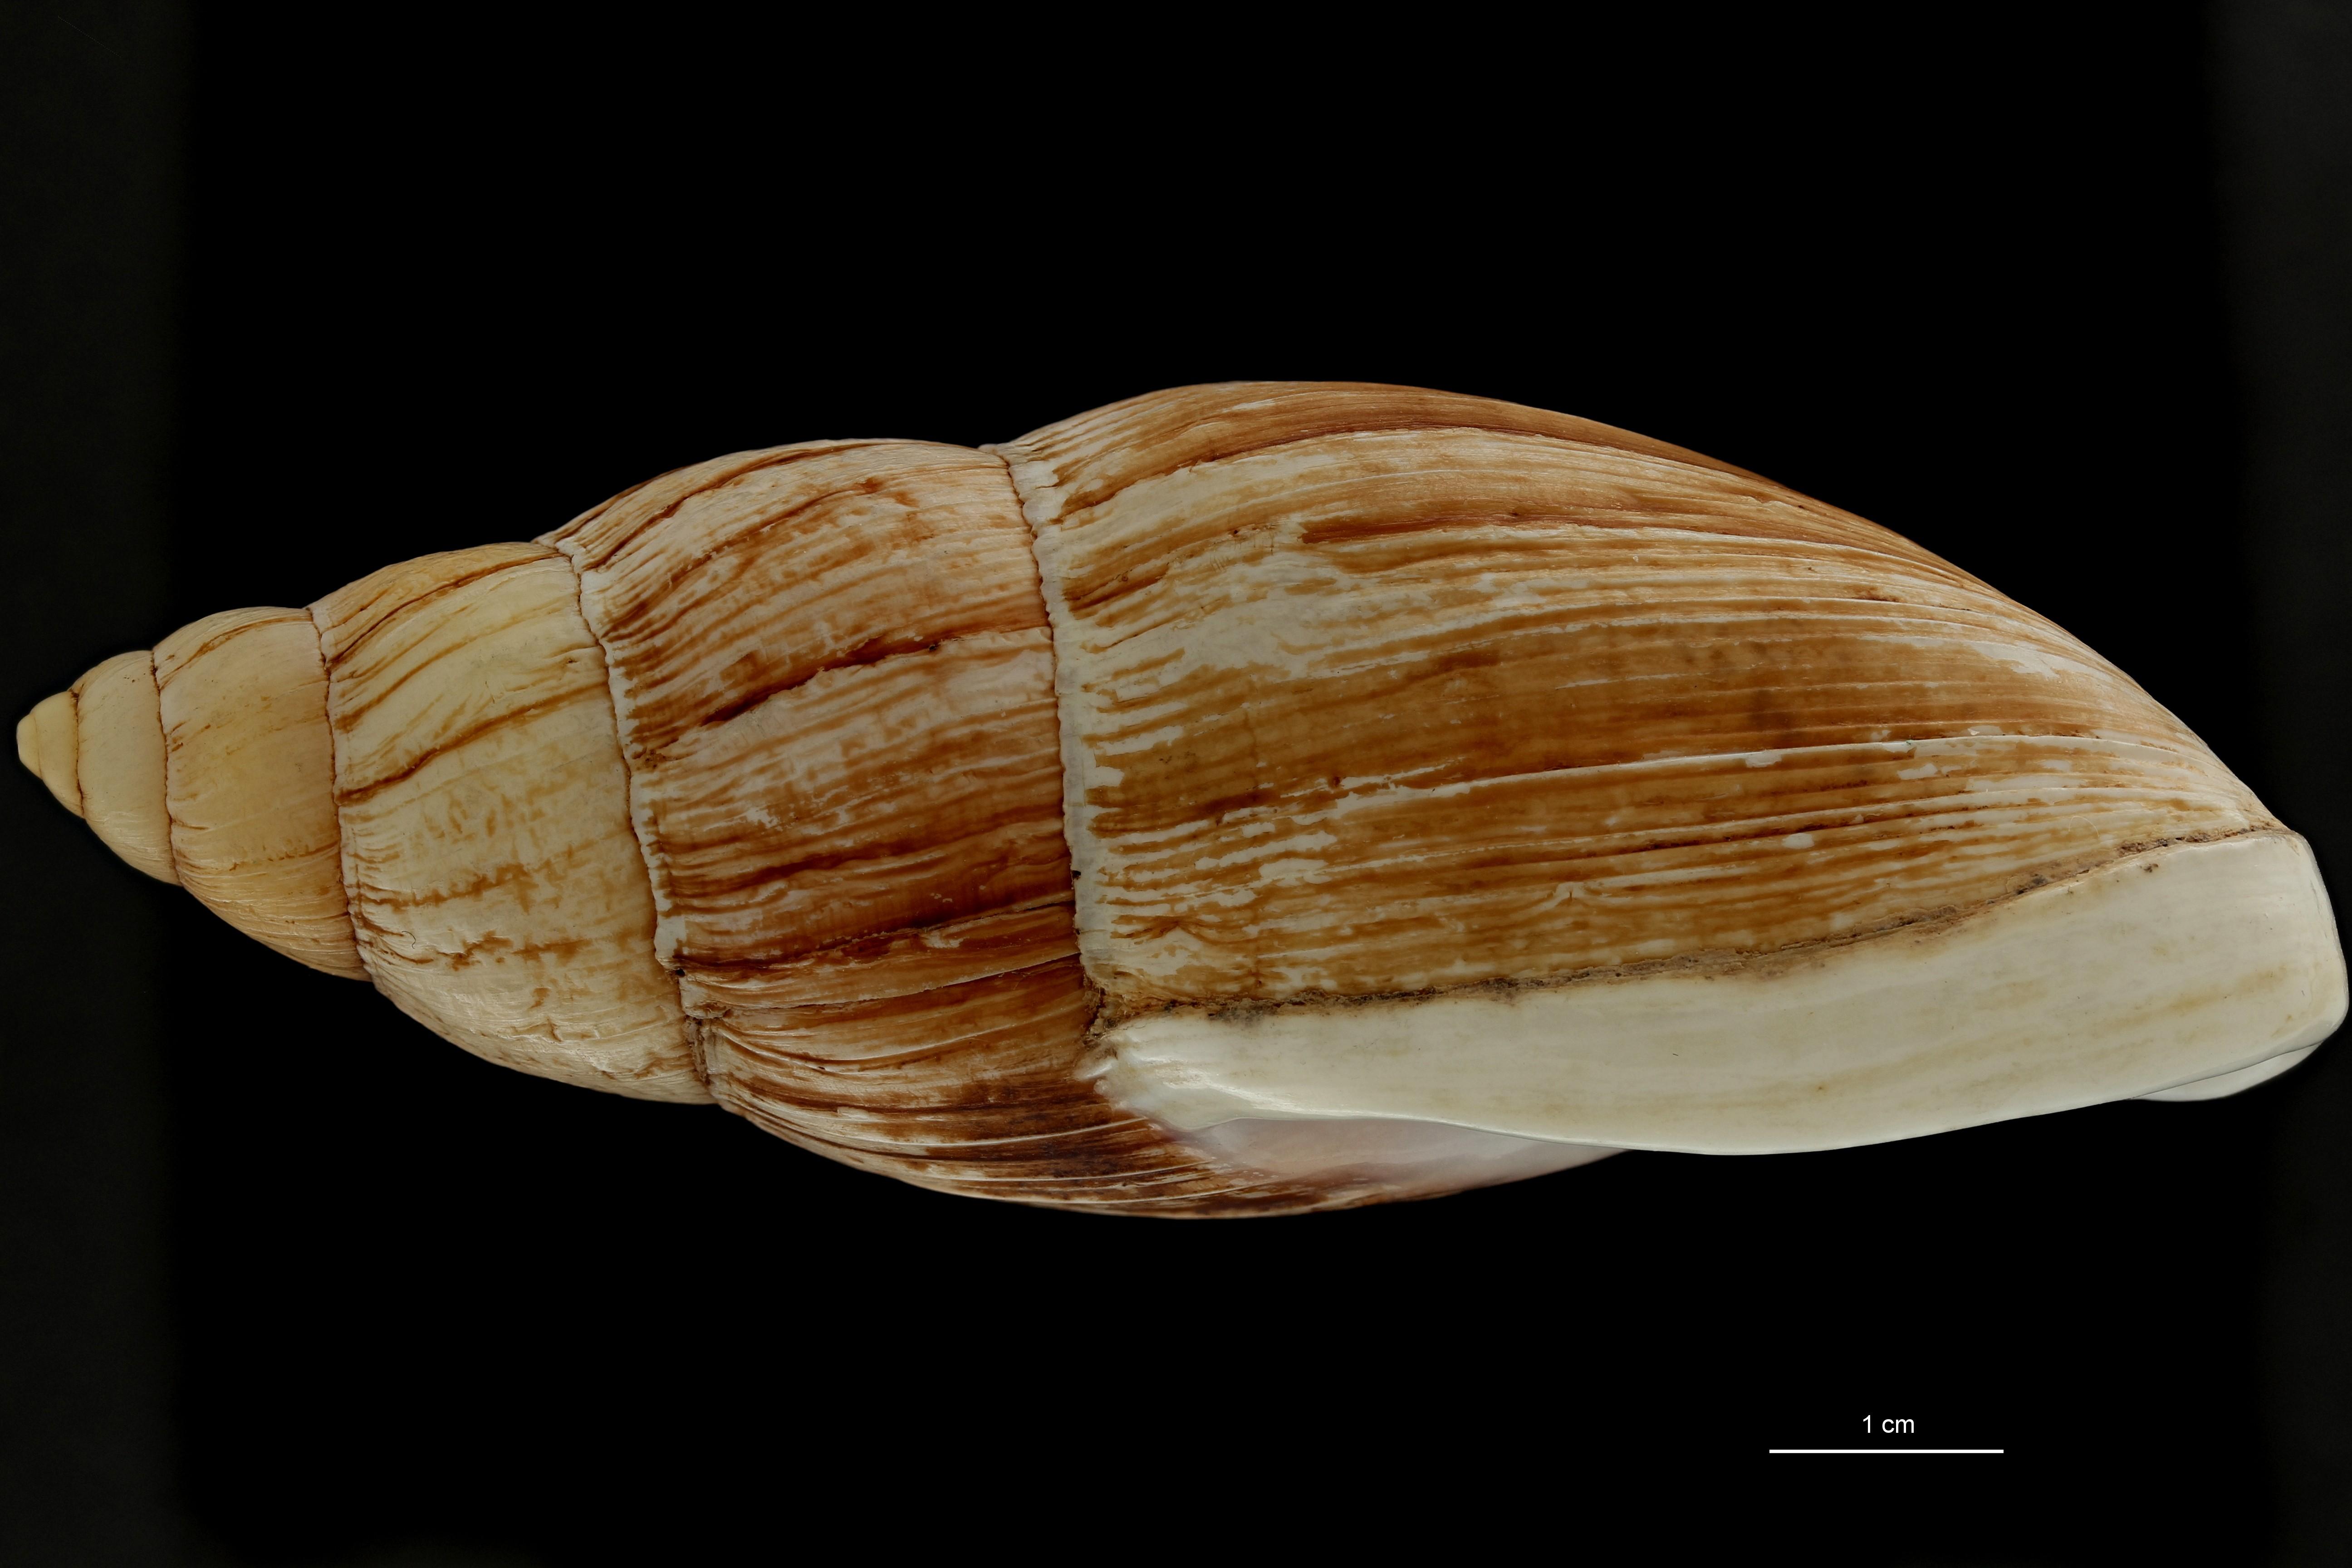 BE-RBINS-INV MT 702 Placostylus porphyrostomus var. elata Type L ZS PMax Scaled.jpg